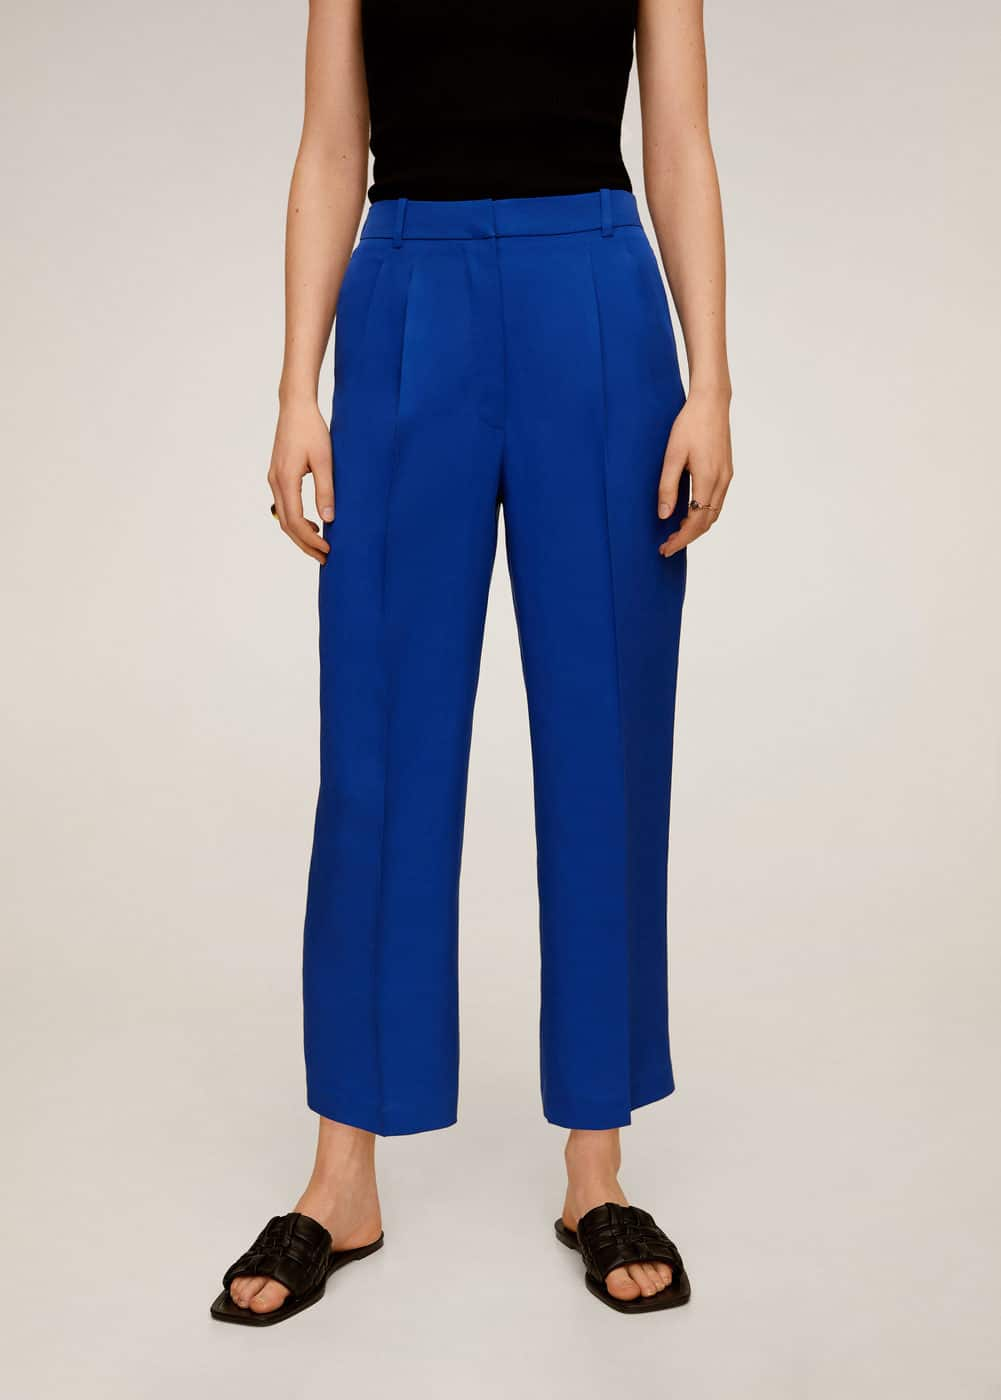 m-monaco:pantalon detalle pinzas